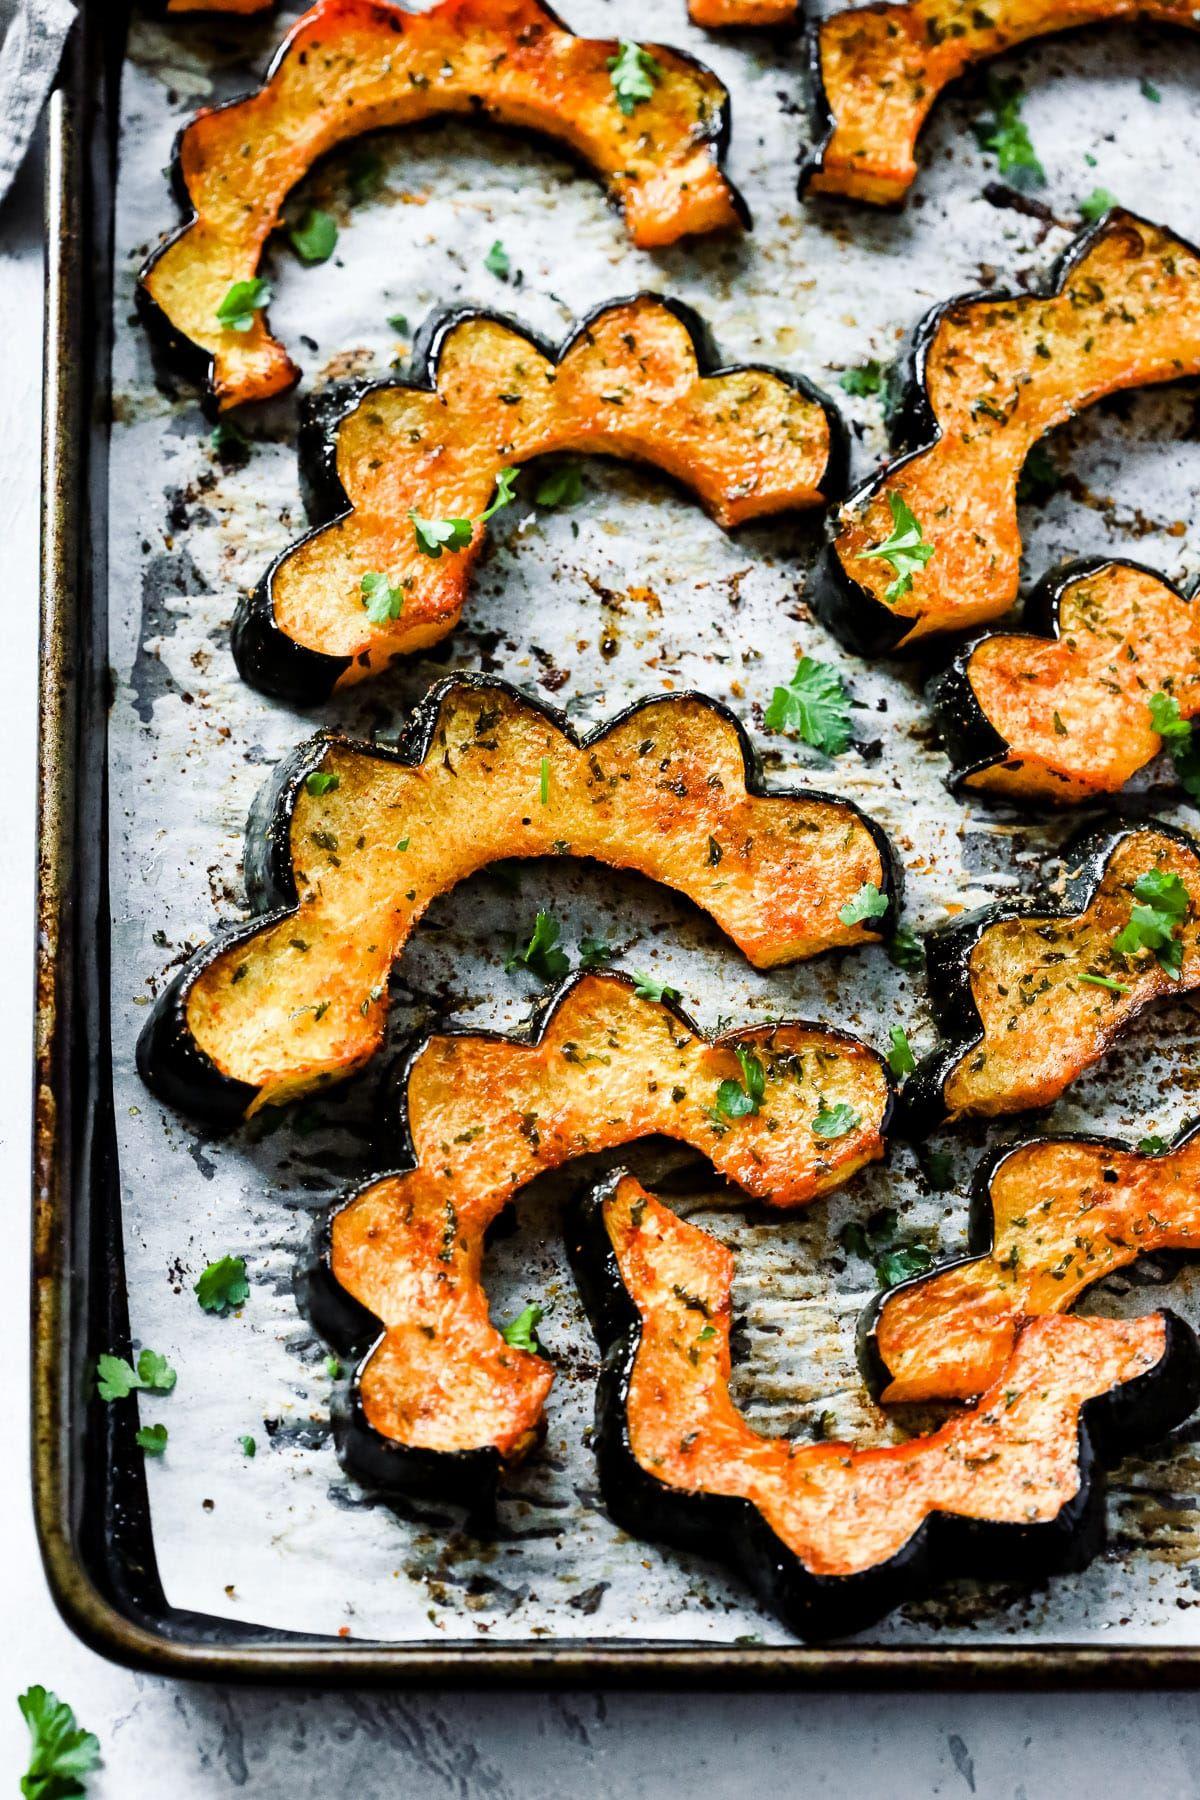 Easy Roasted Acorn Squash Recipe Acorn Squash Recipes Healthy